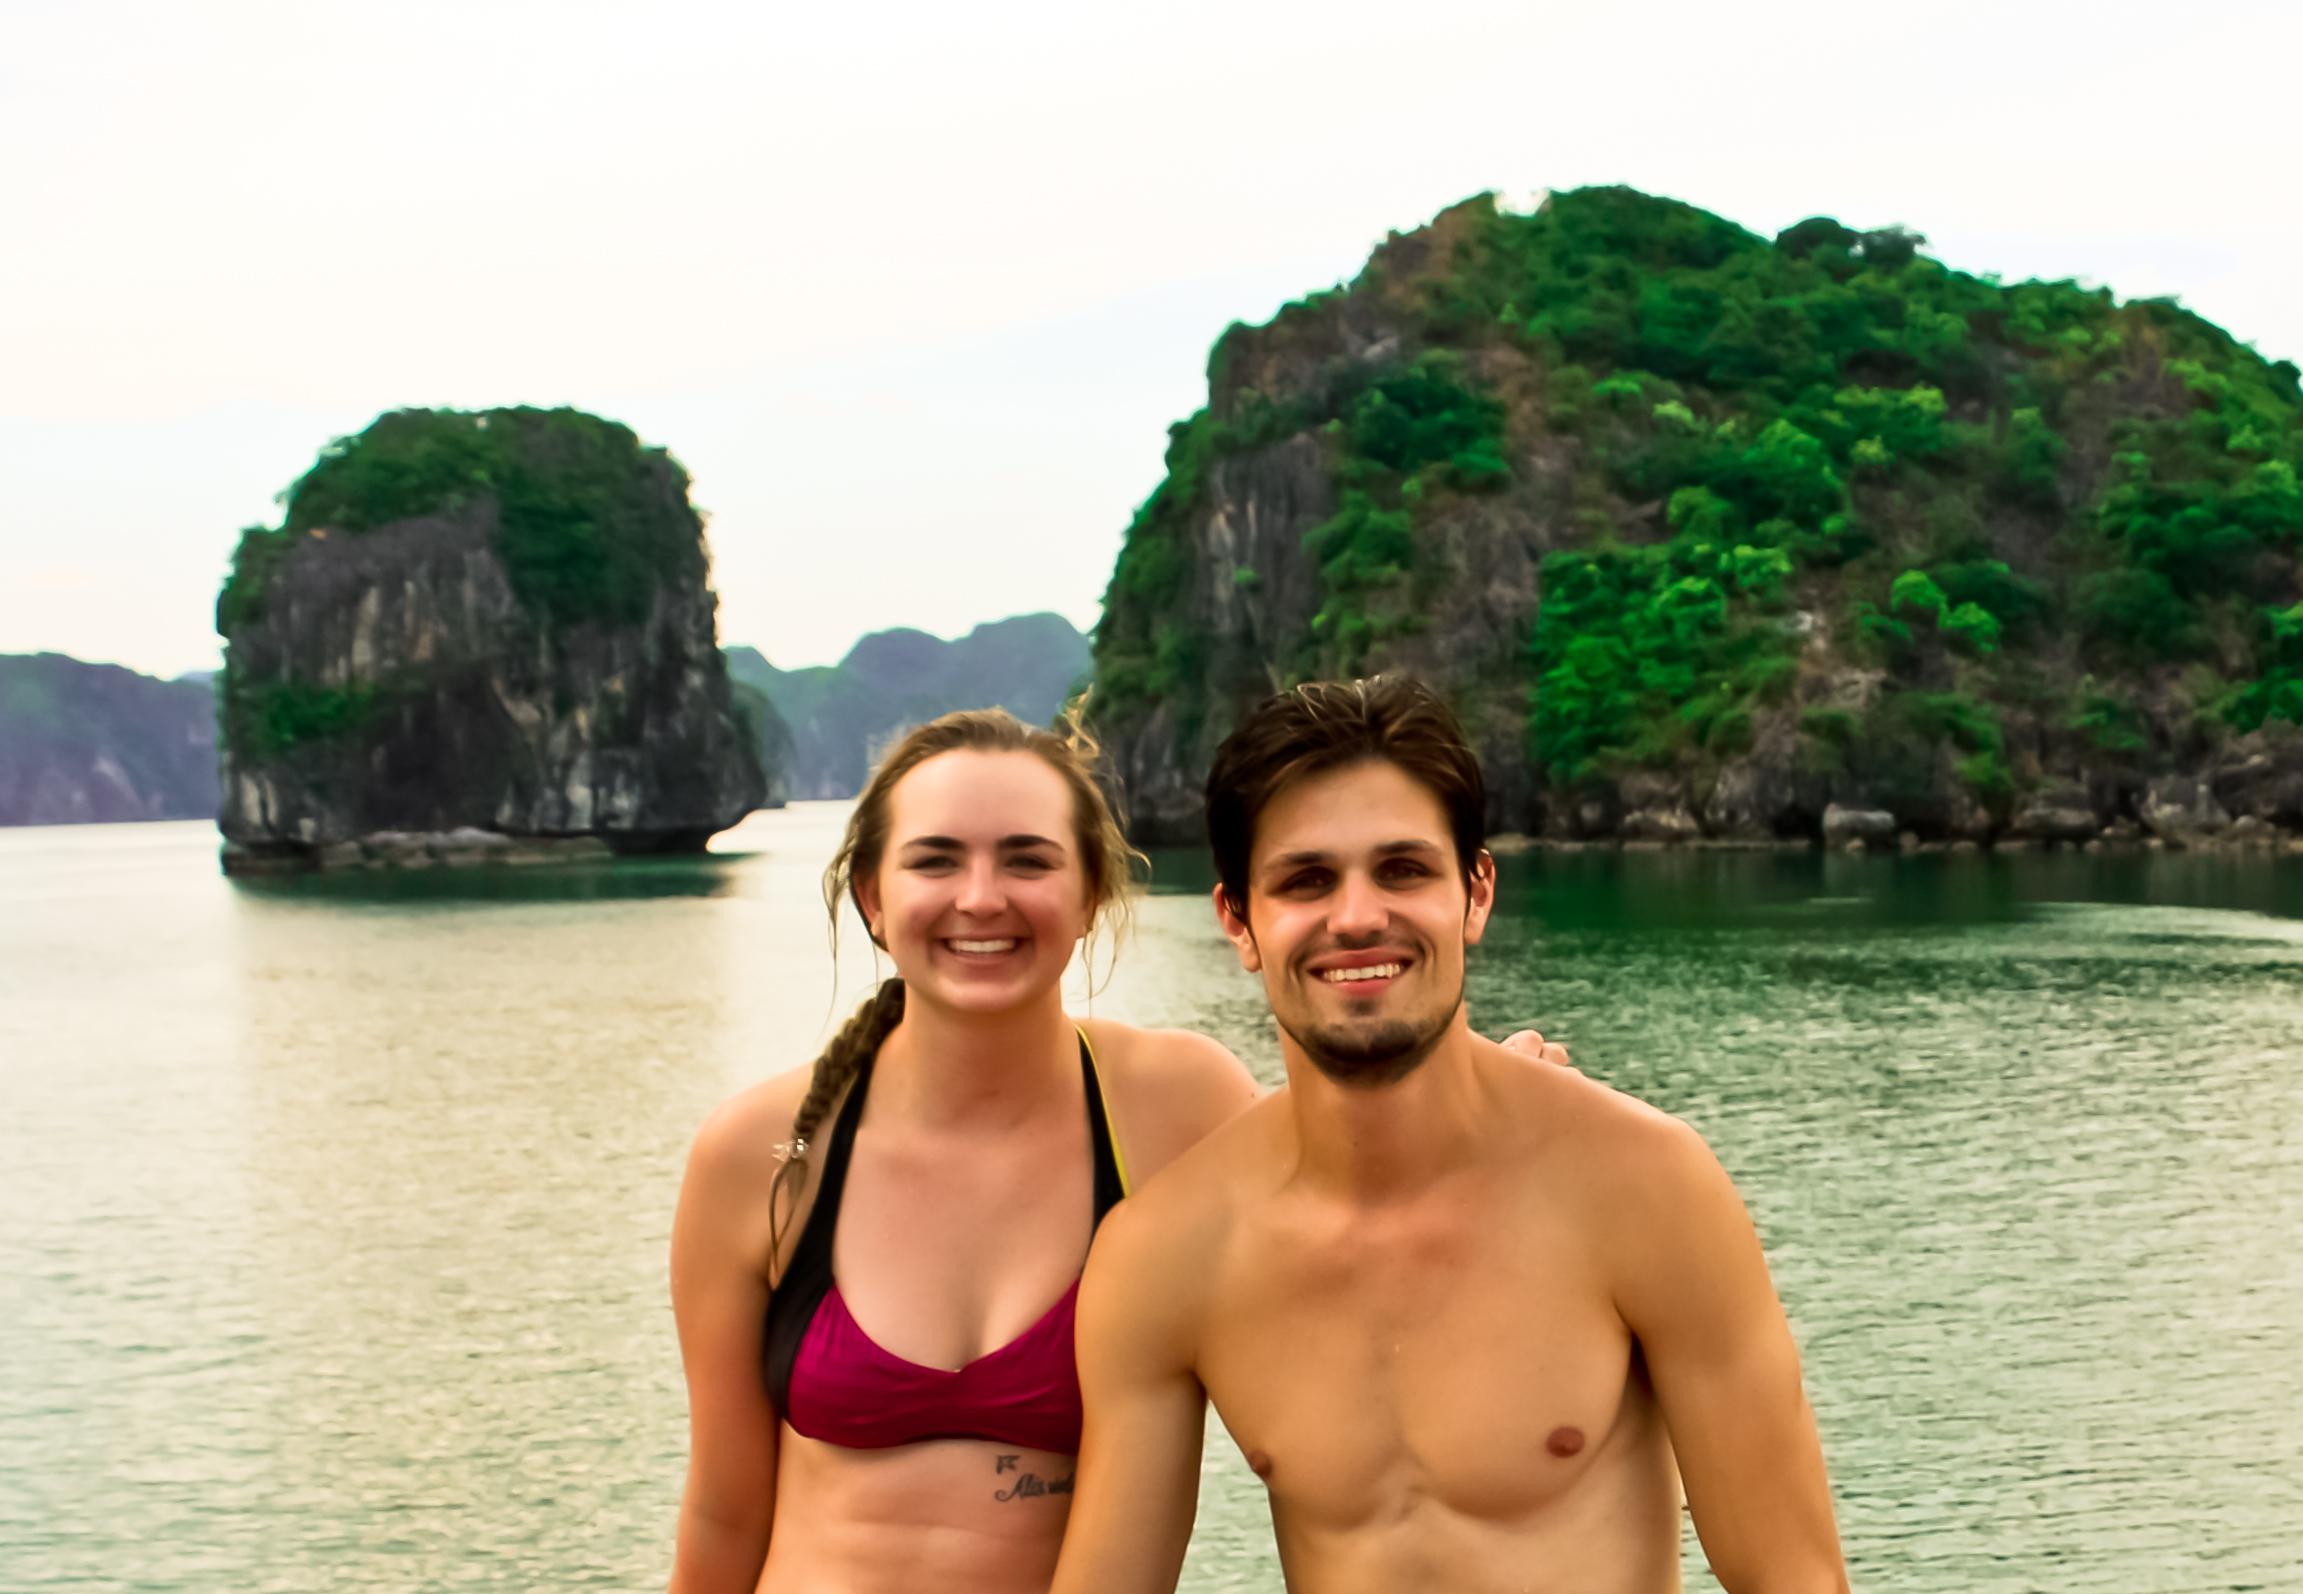 Megan and her friend, Ronald, in Vietnam.